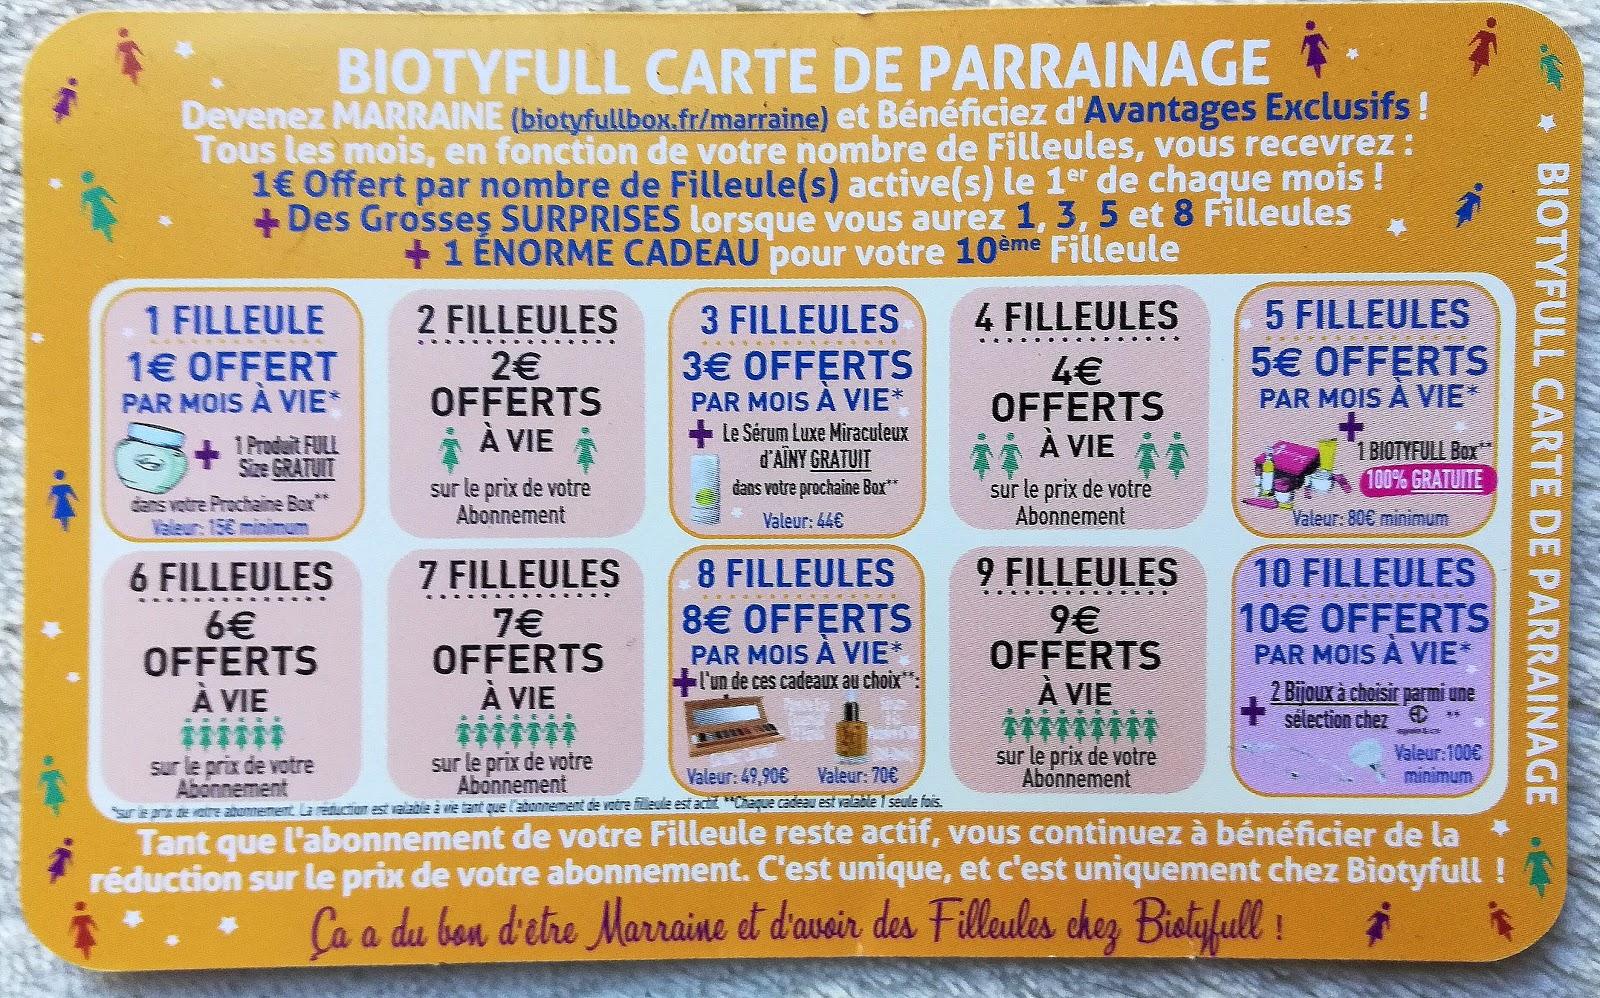 parrainnage biotyfull box